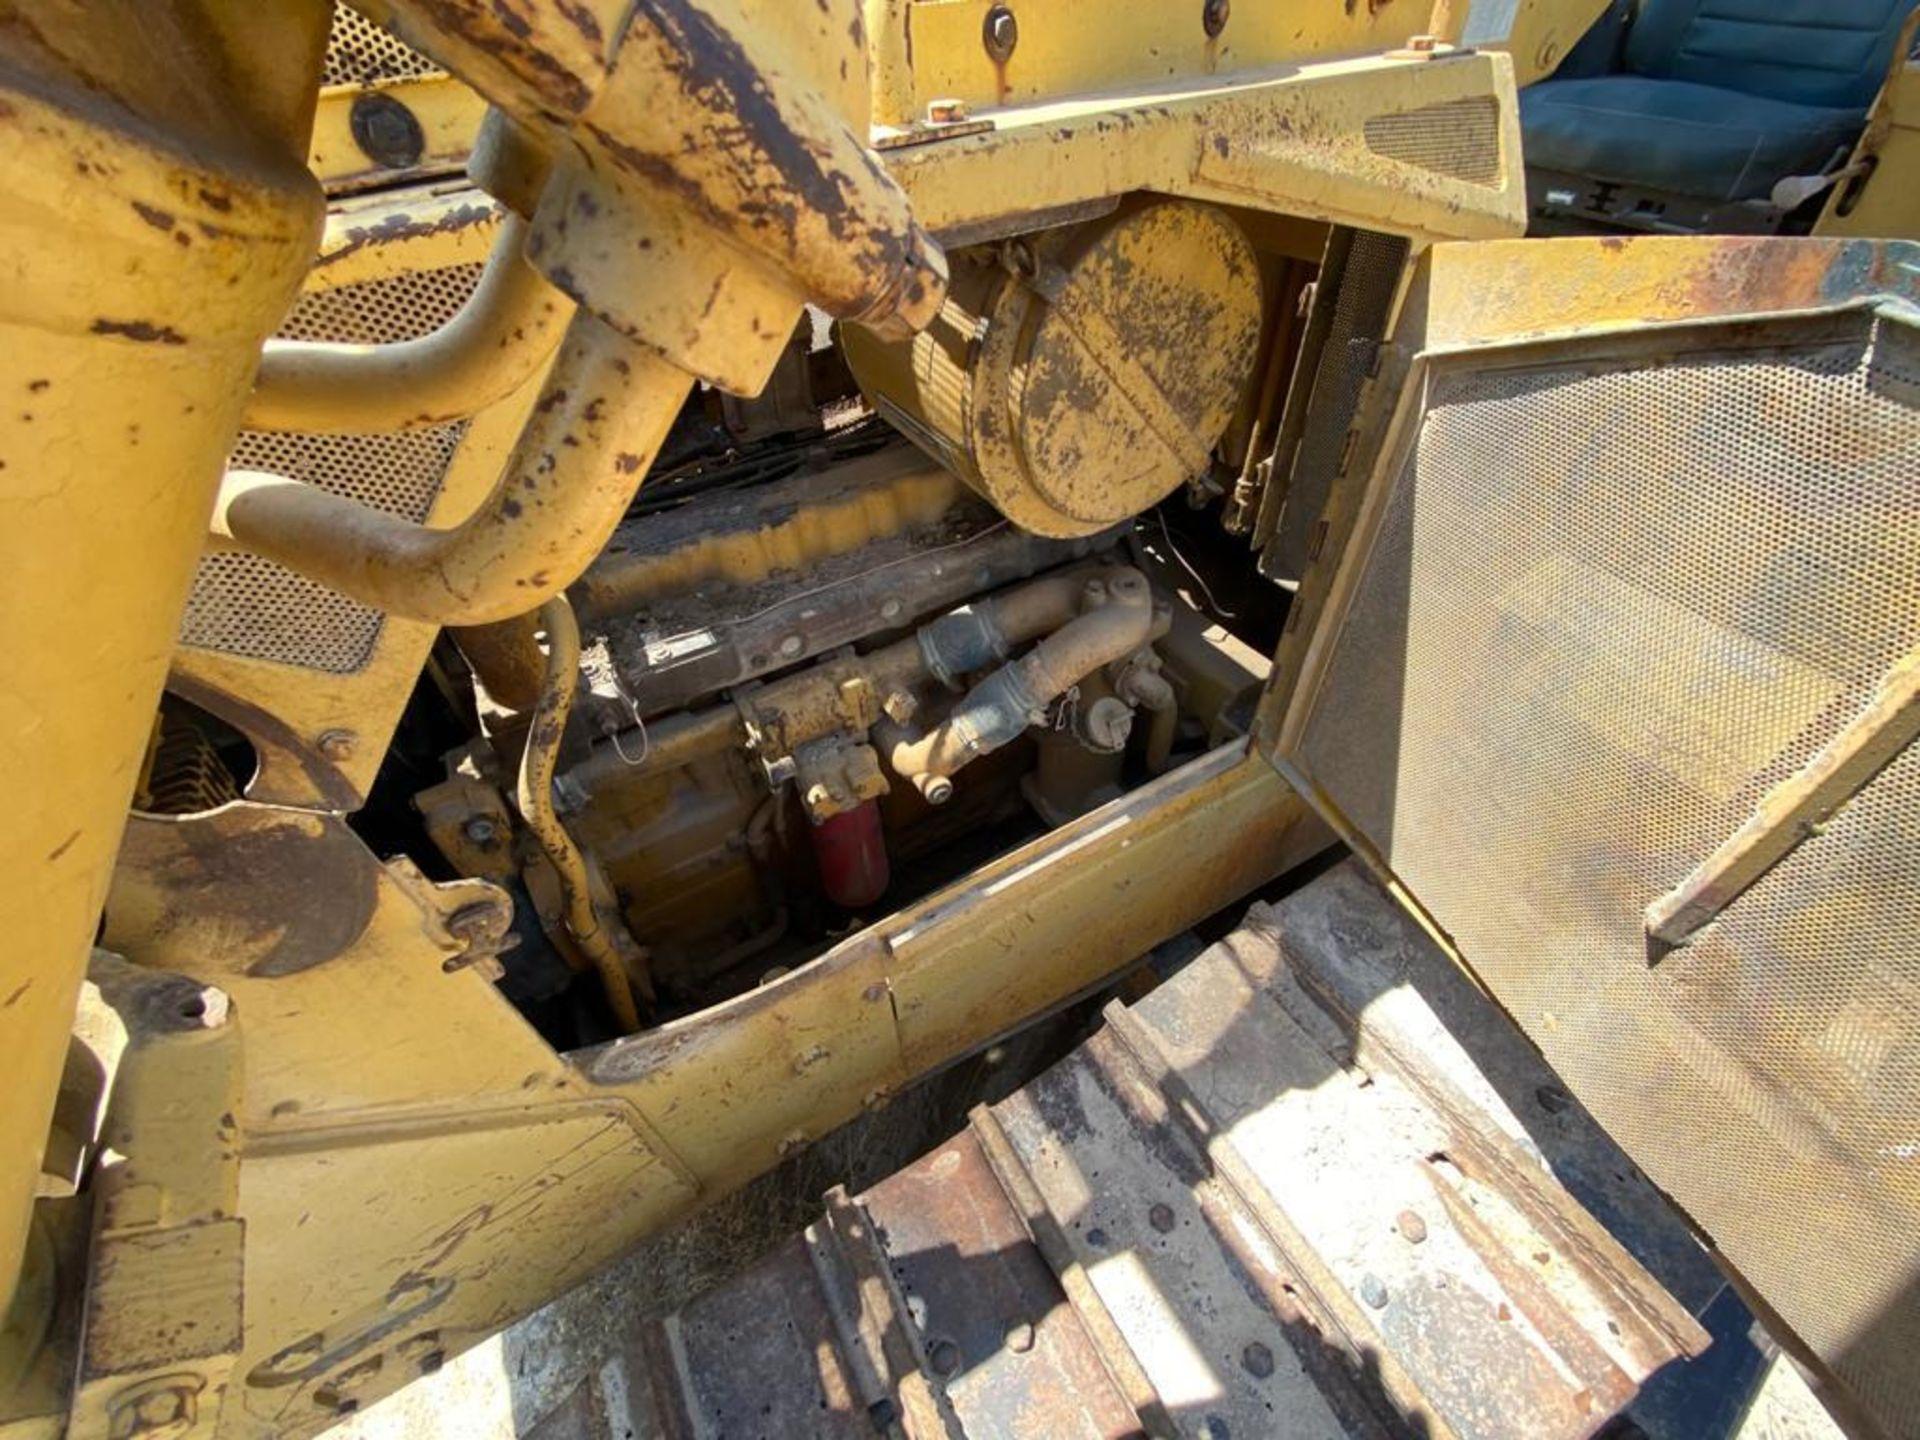 Caterpillar D7G Bulldozer, Serial number 92V5897, Diesel motor - Image 29 of 48